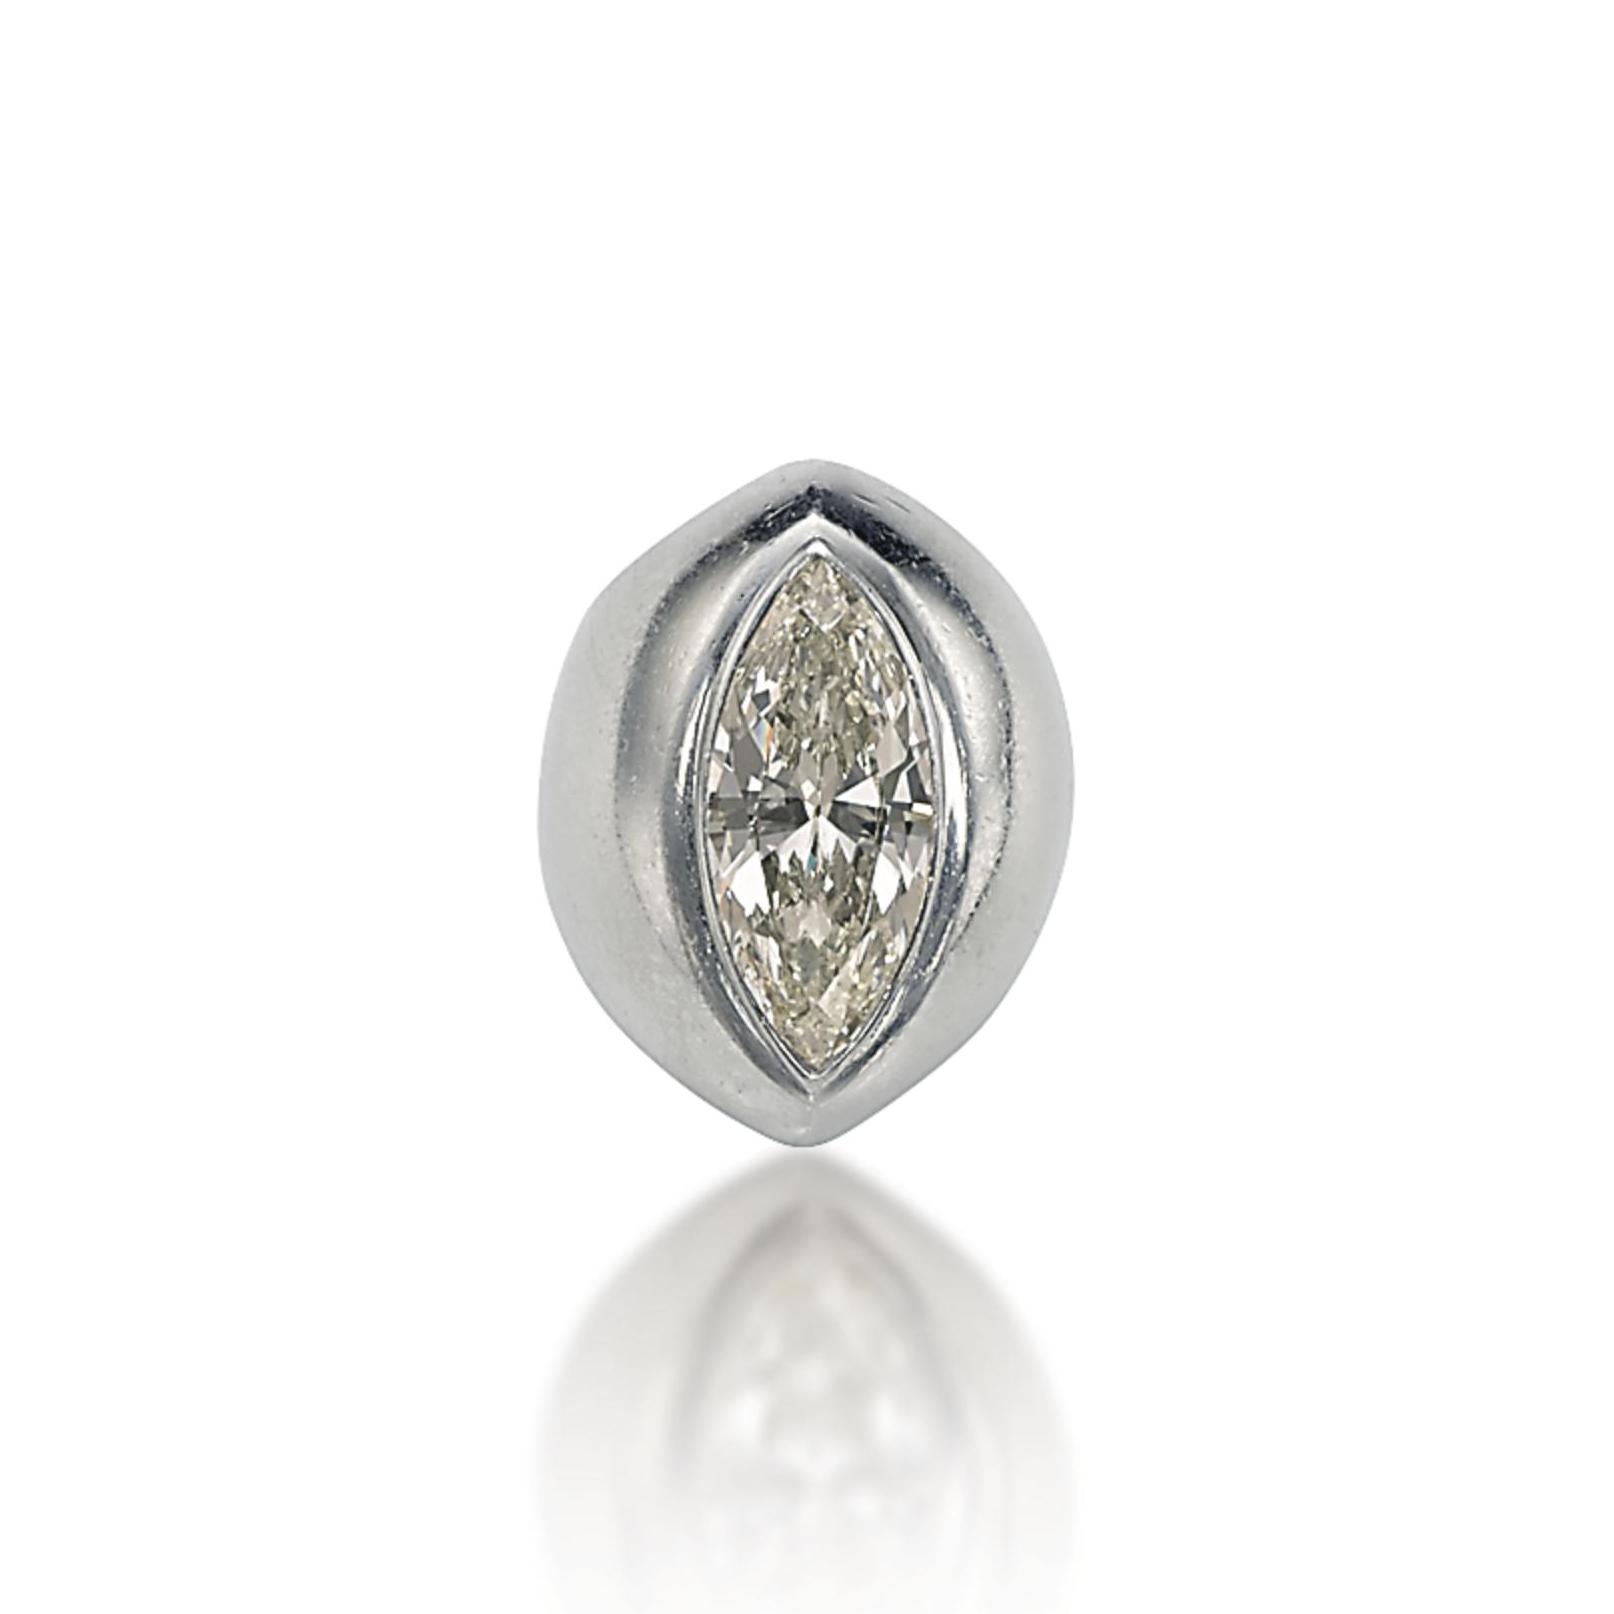 A DIAMOND RING, BY HERZ-BELPERRON